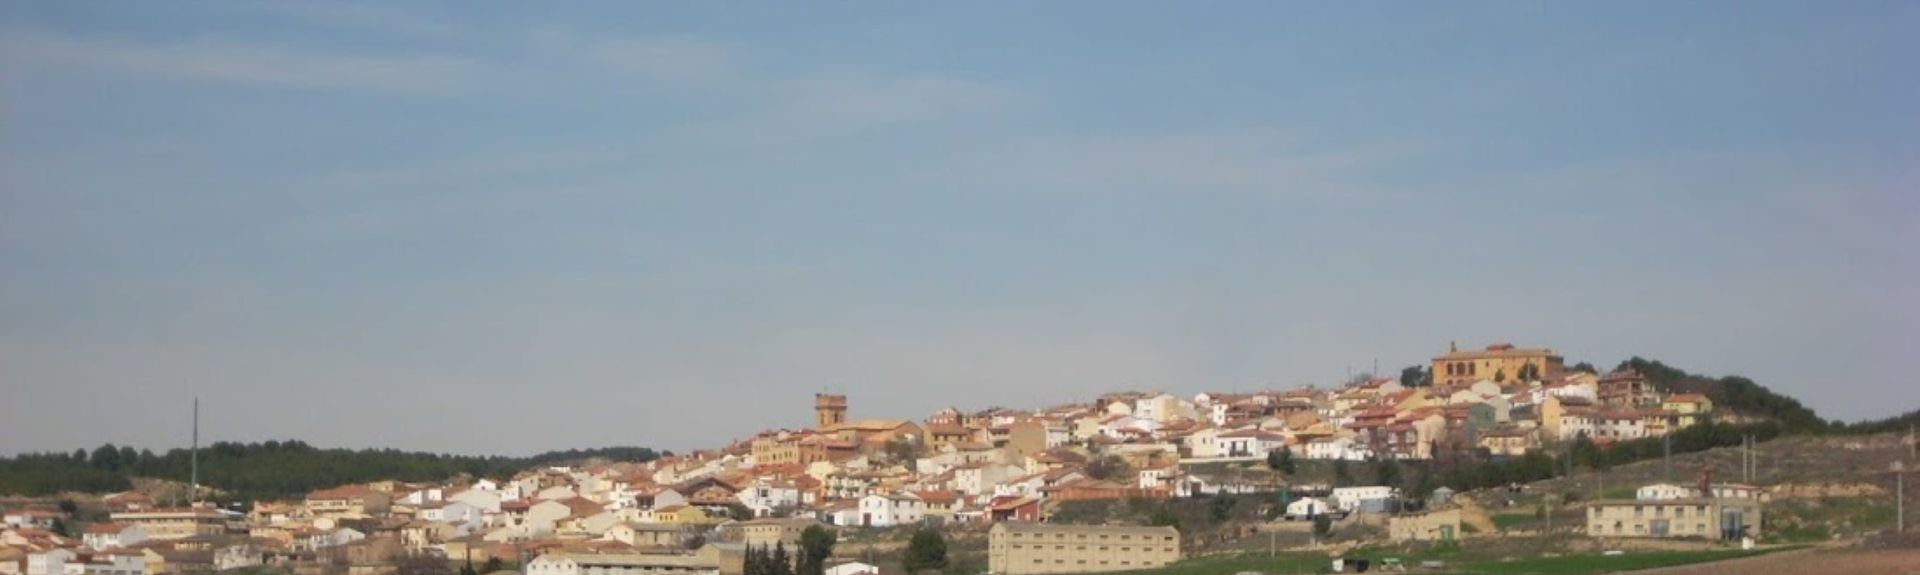 Alcanadre, La Rioja, Spain